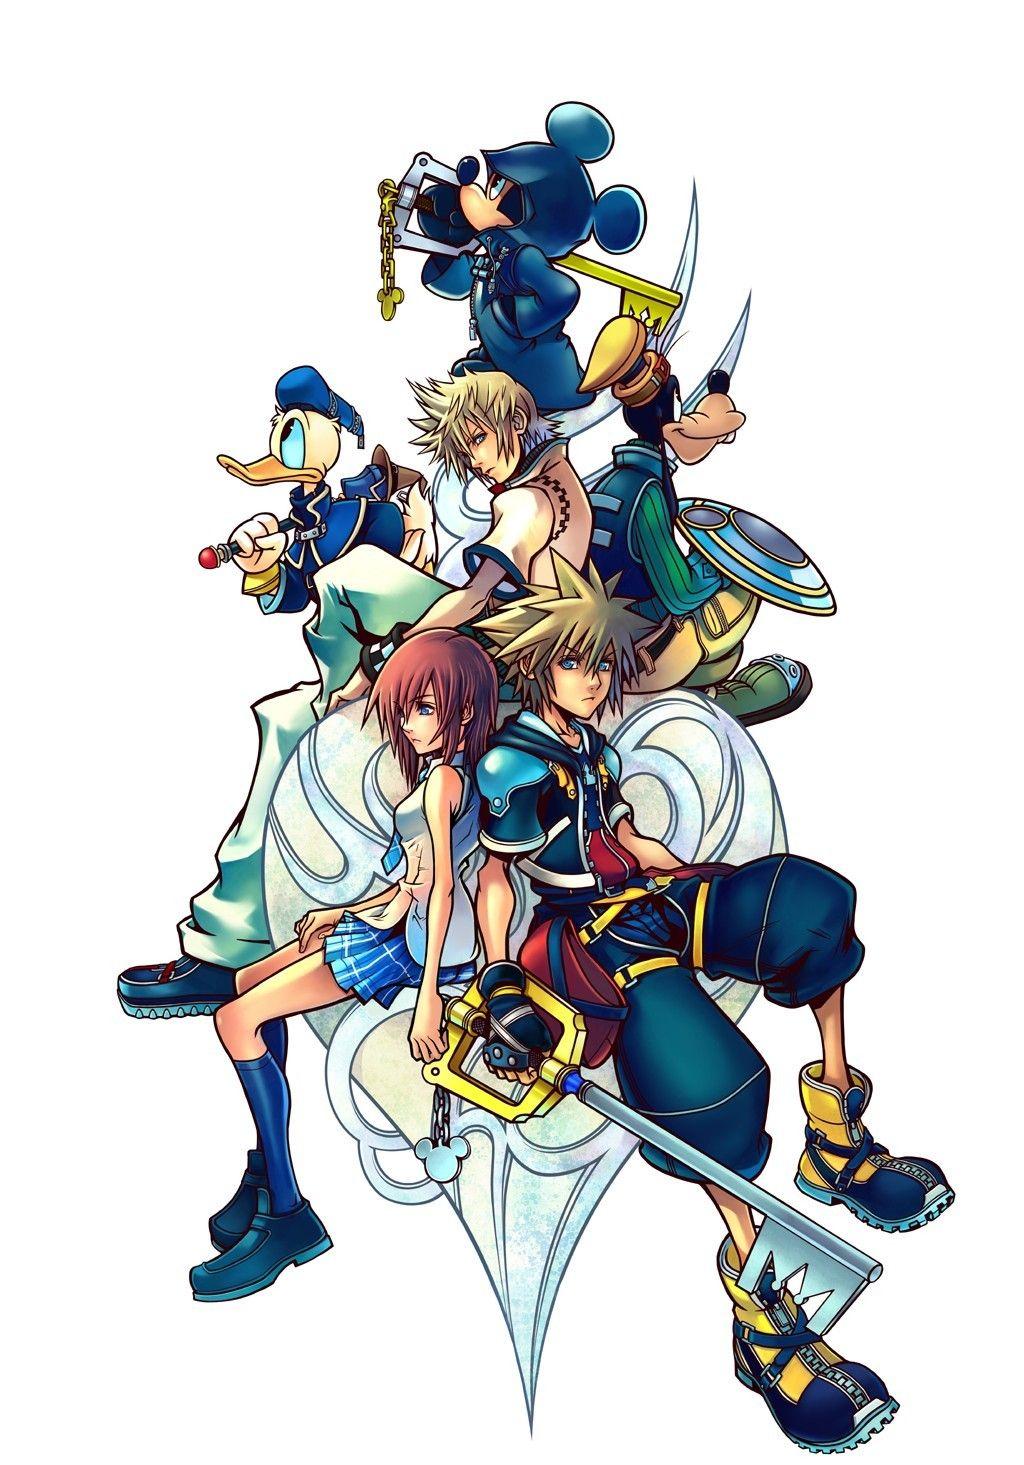 Kingdom Hearts 2 Kingdom Hearts Wallpaper Kingdom Hearts Ii Kingdom Hearts